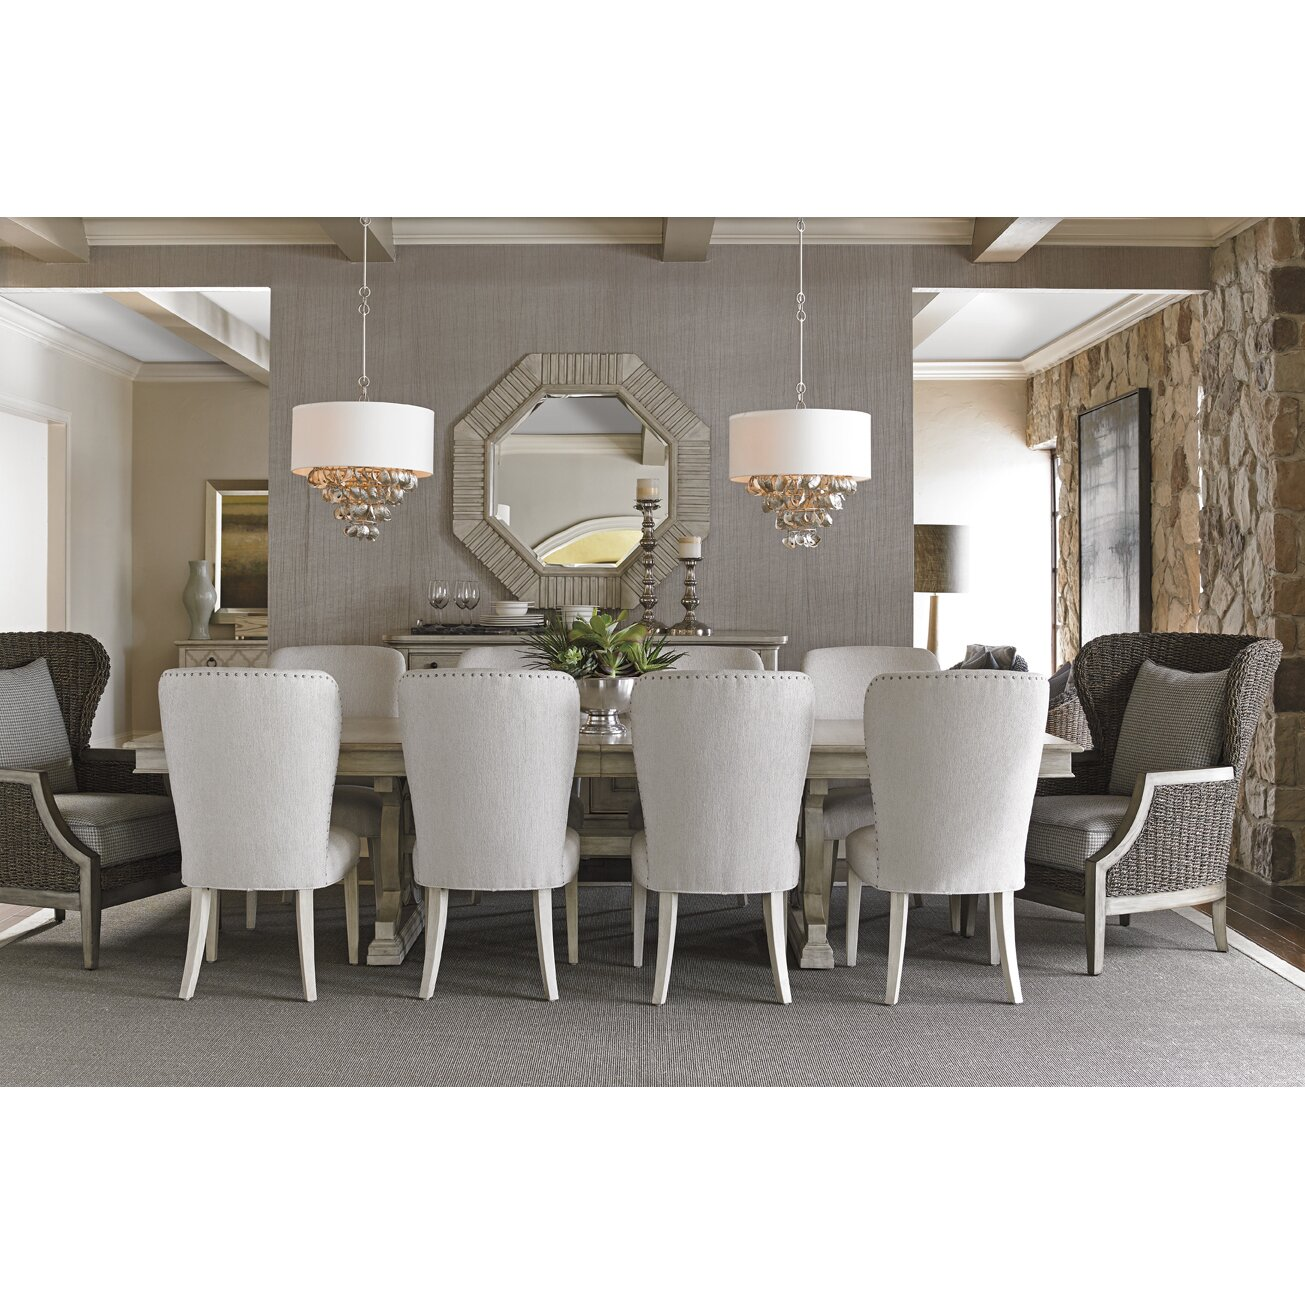 Lexington Cherry Dining Room Set